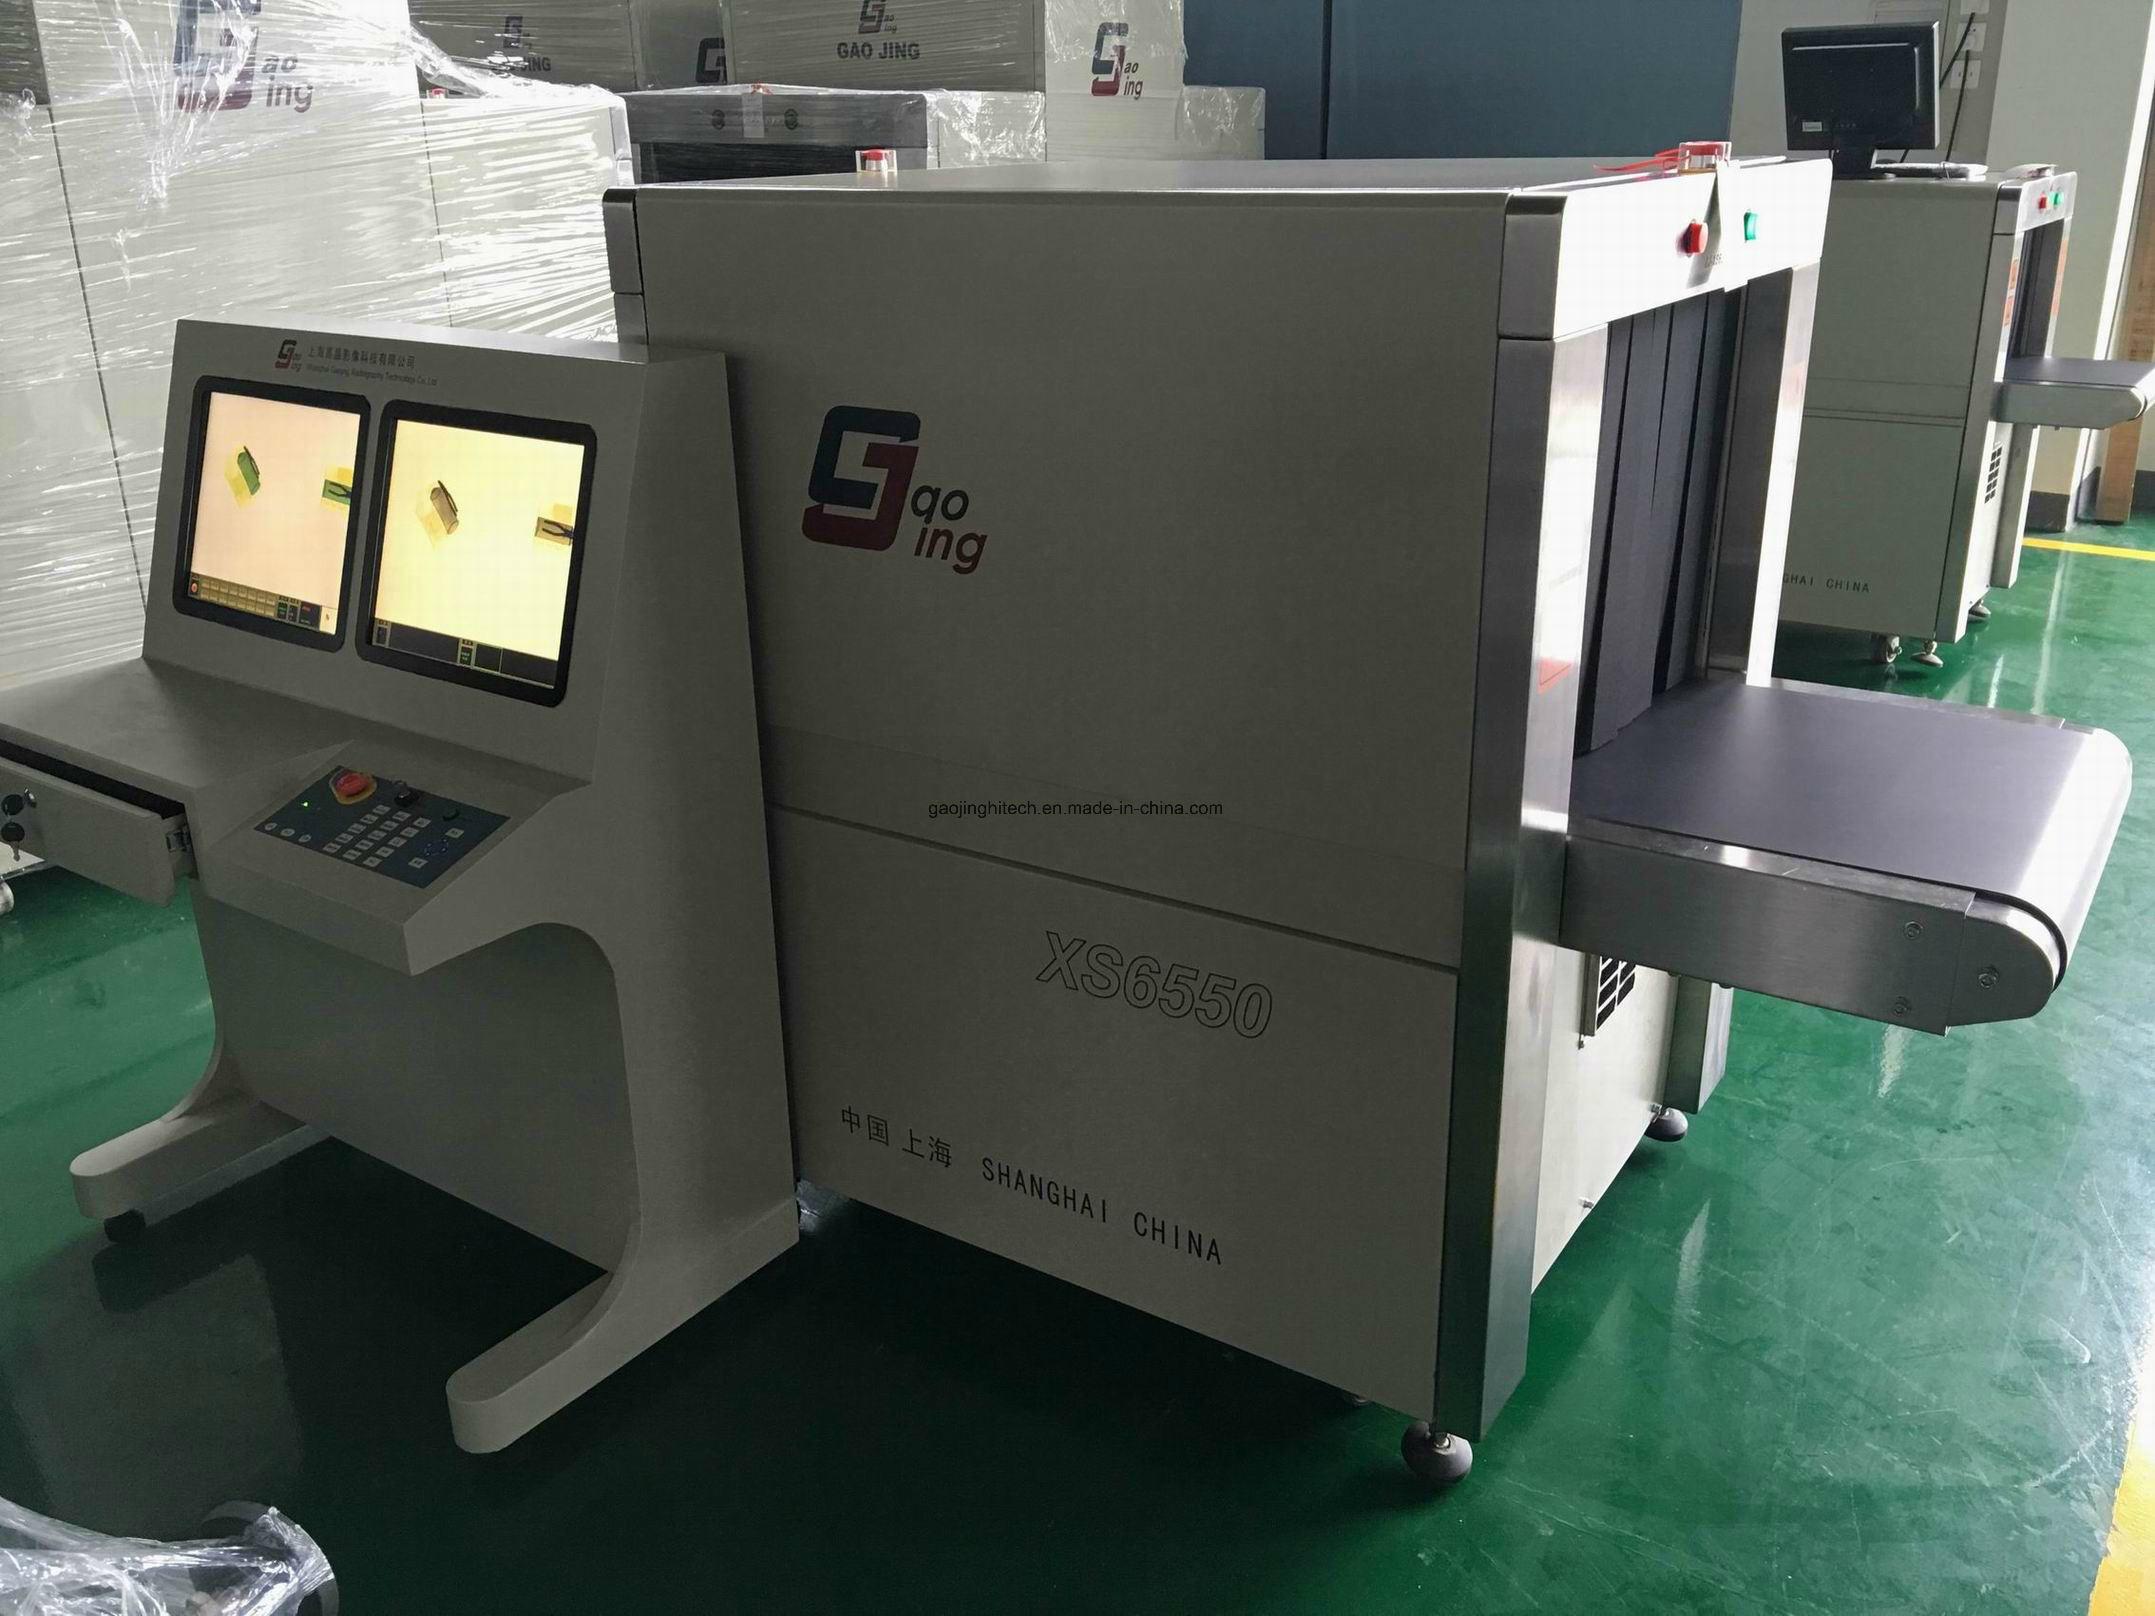 Gj-Xs-6550 X-ray Security Inspection Machine